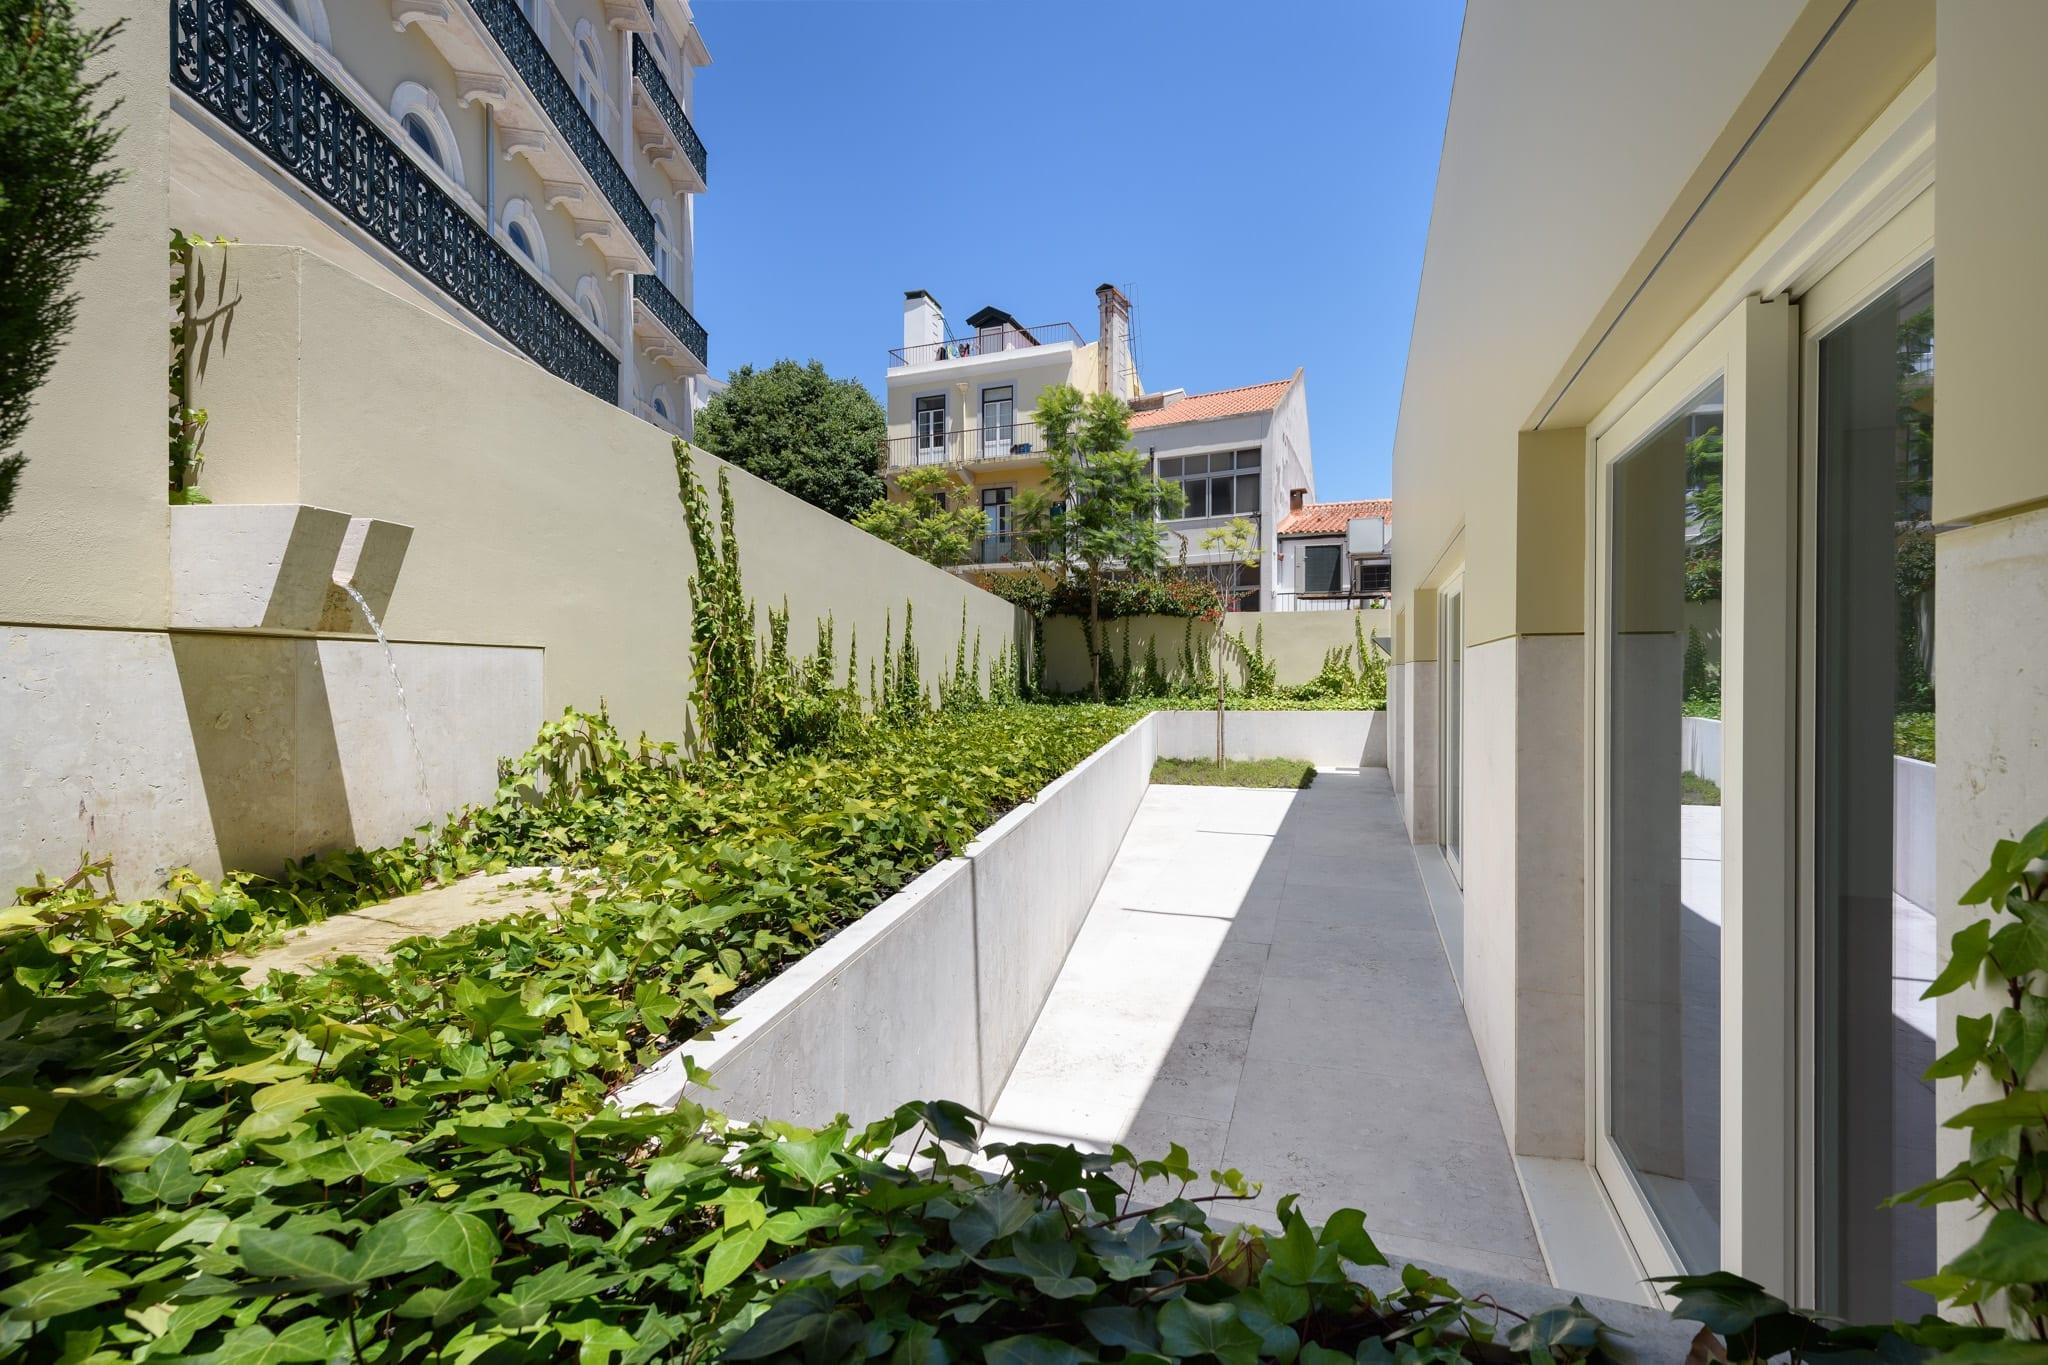 moradia_apartamento_jardim_lisboa_principe_real_faria_palacio